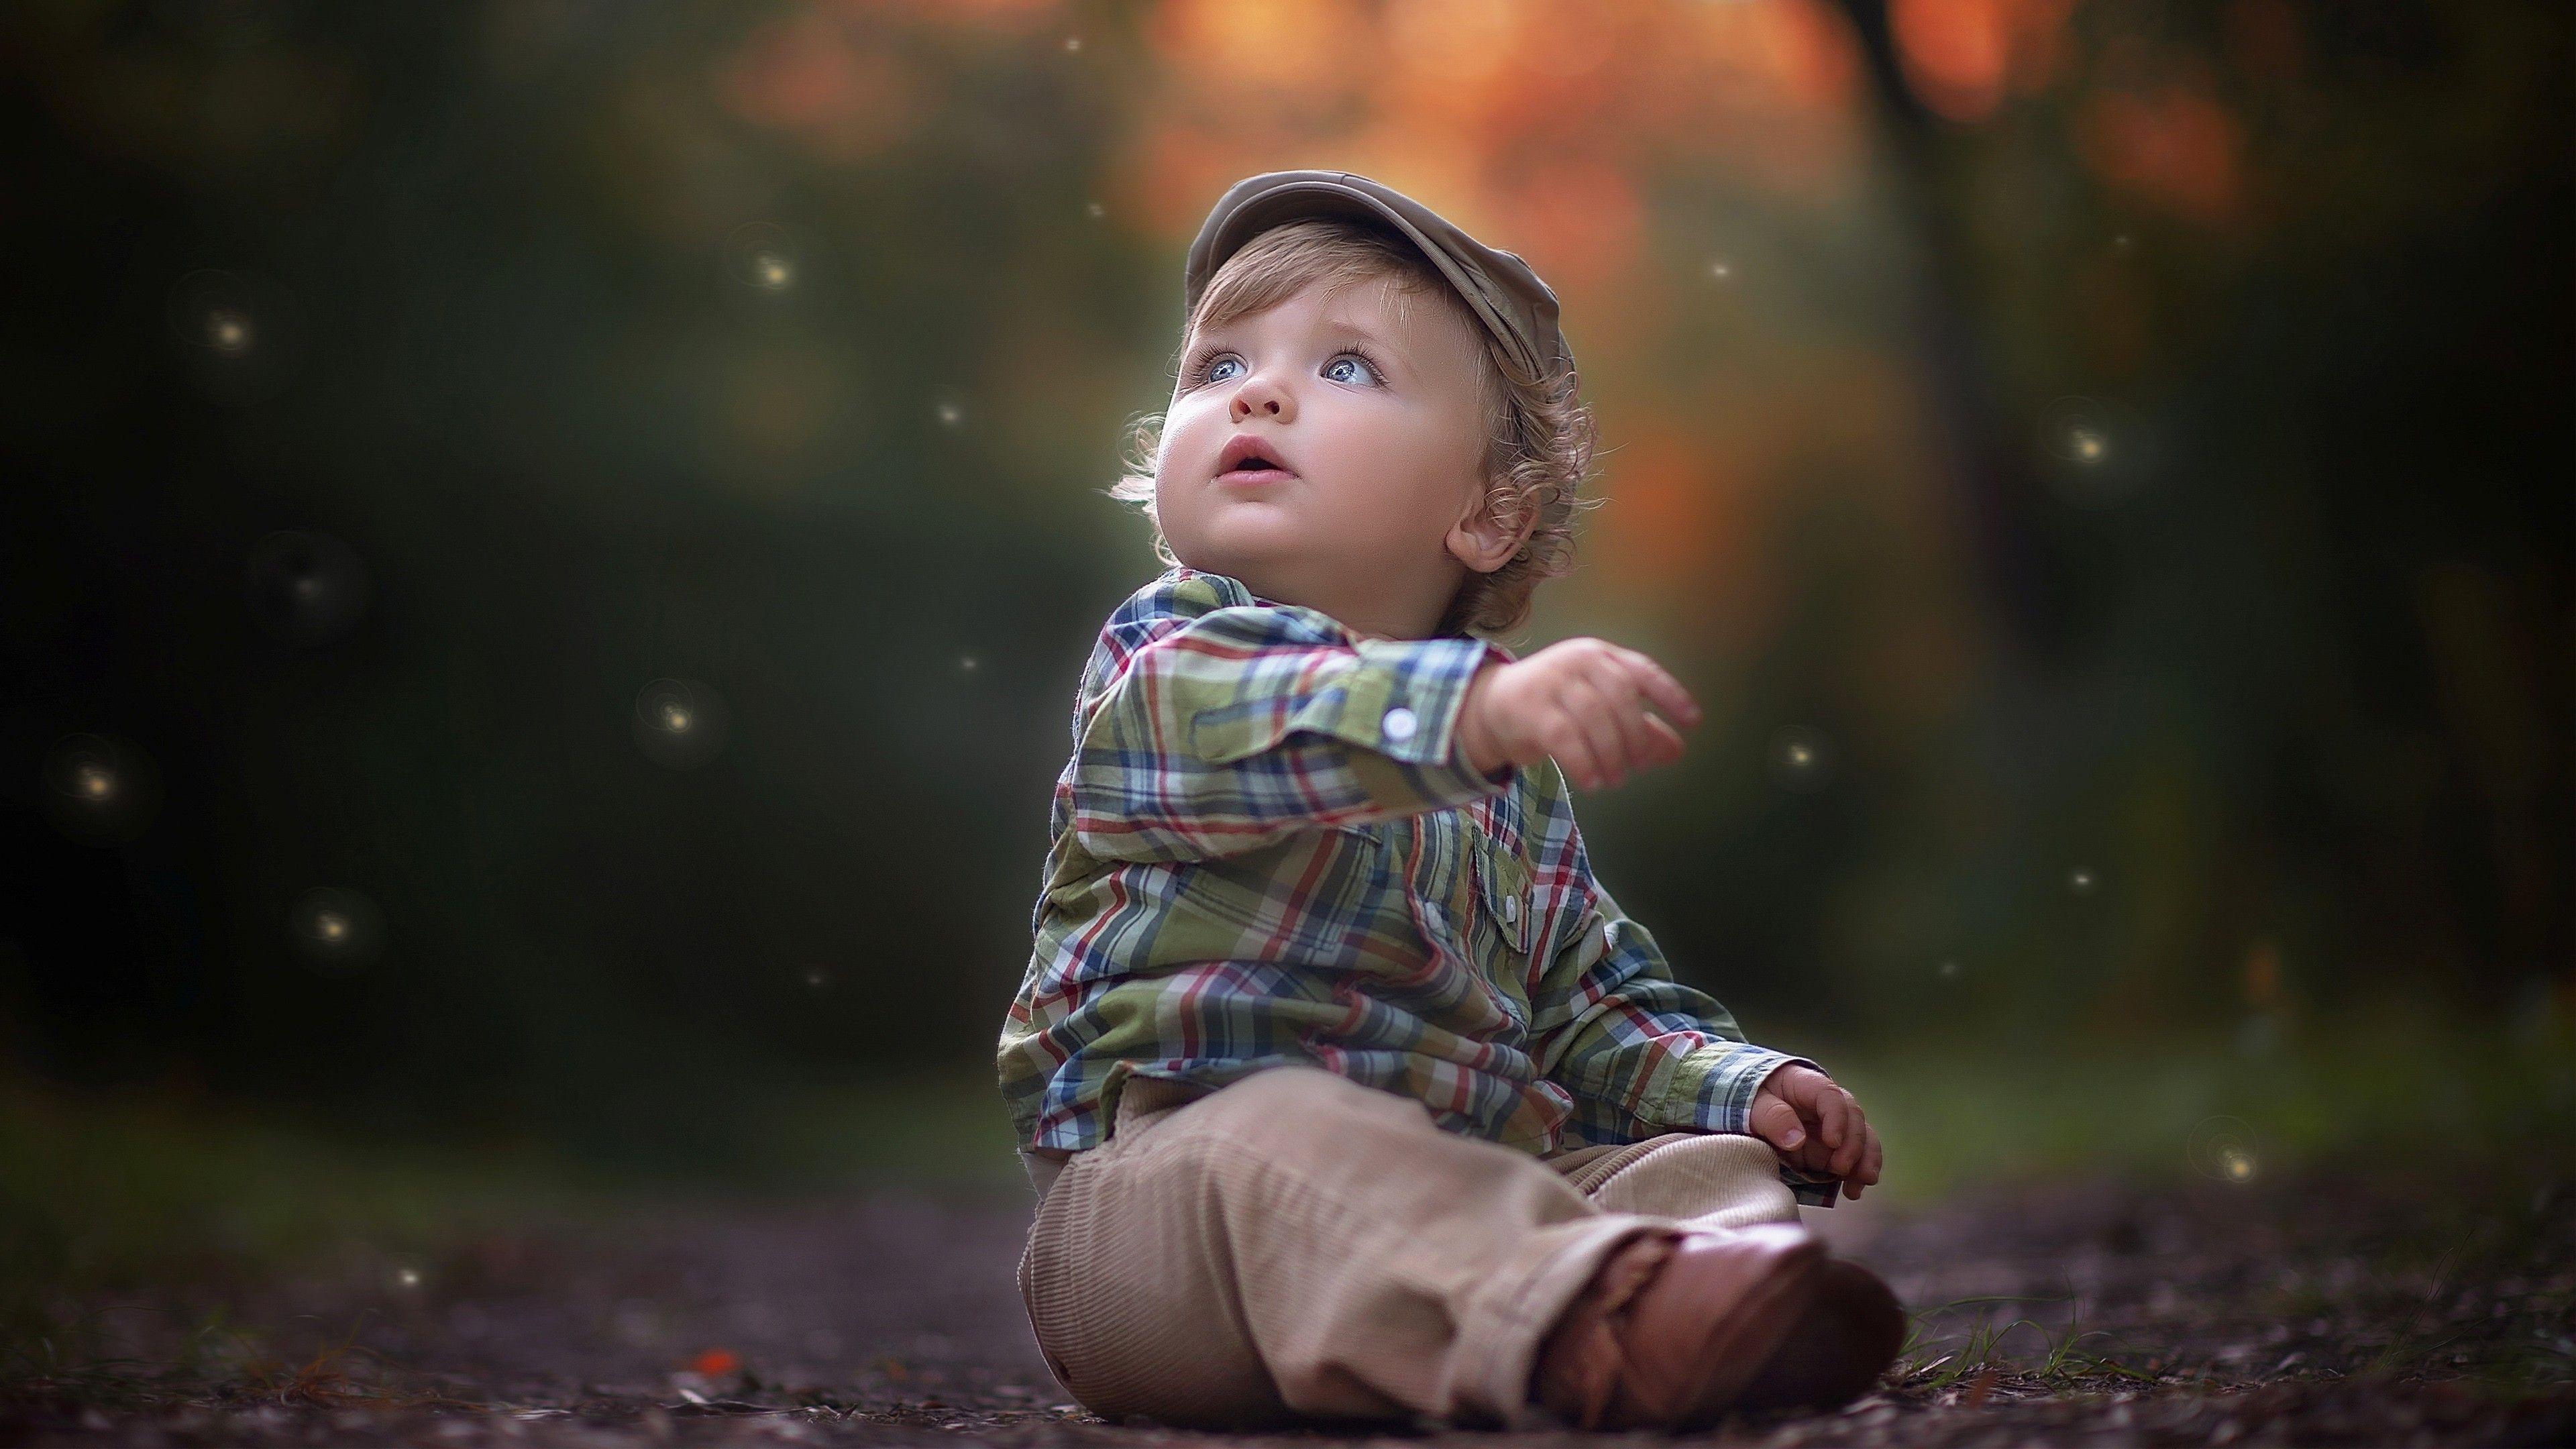 Baby 4K Wallpapers - Top Free Baby 4K ...